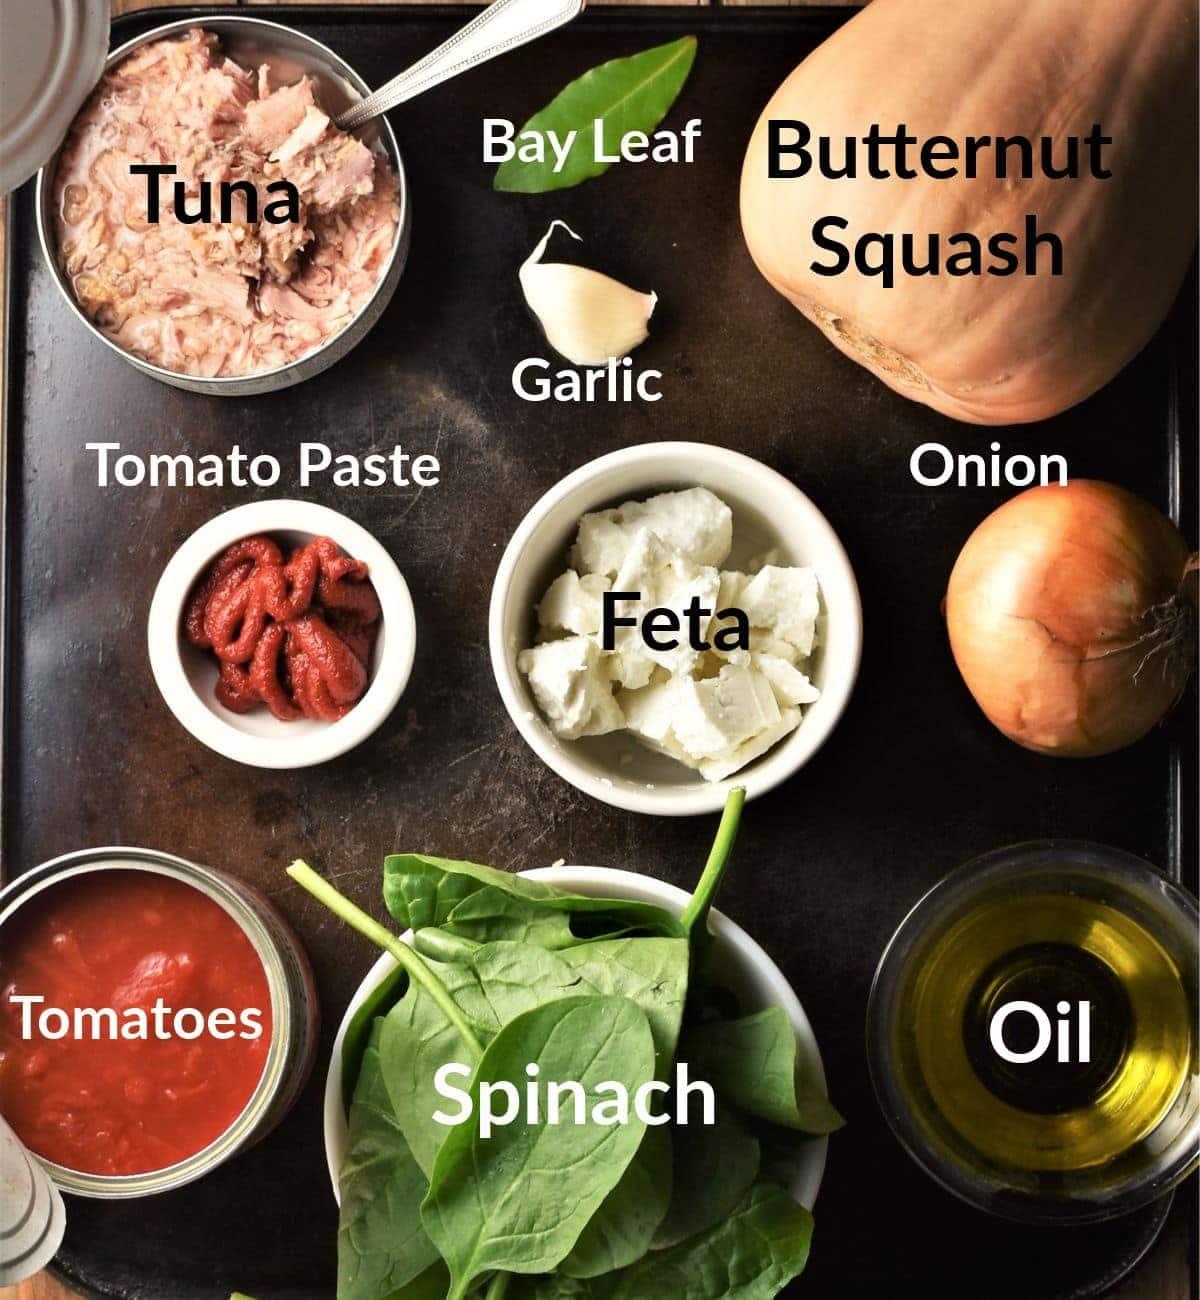 Tuna bake ingredients in individual dishes.